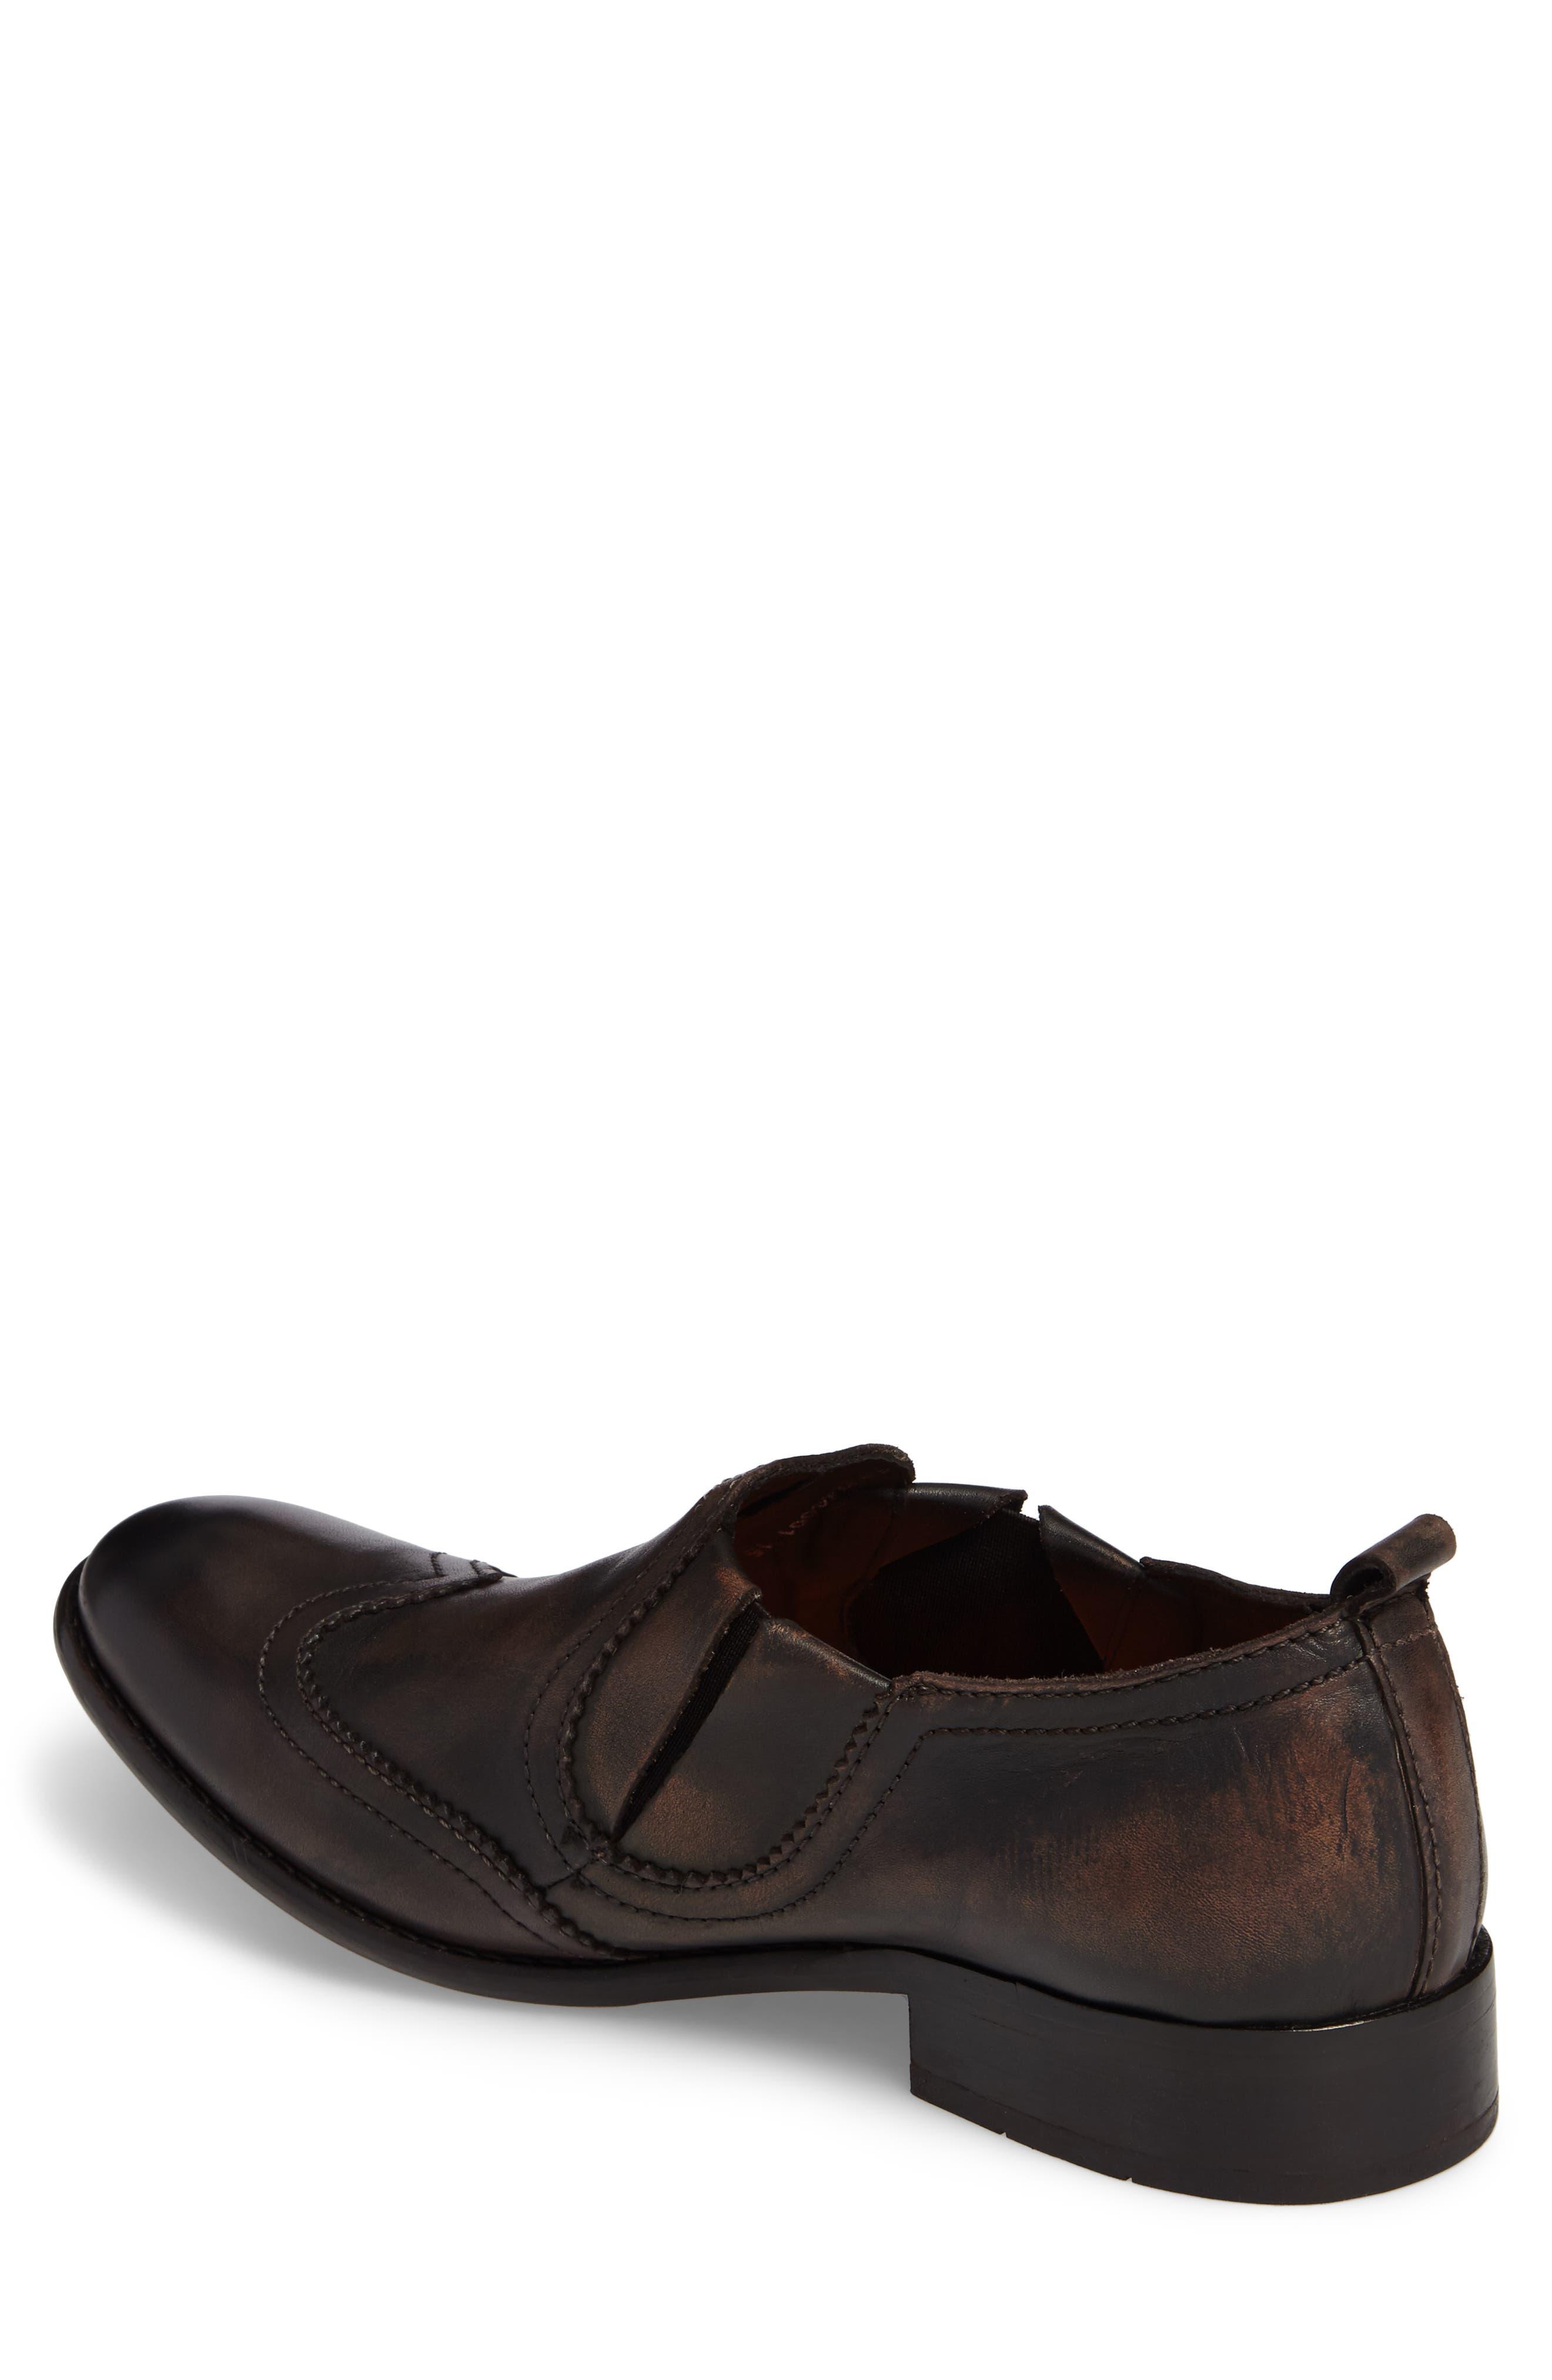 Wyat Wingtip Slip-On Loafer,                             Alternate thumbnail 2, color,                             Dark Brown